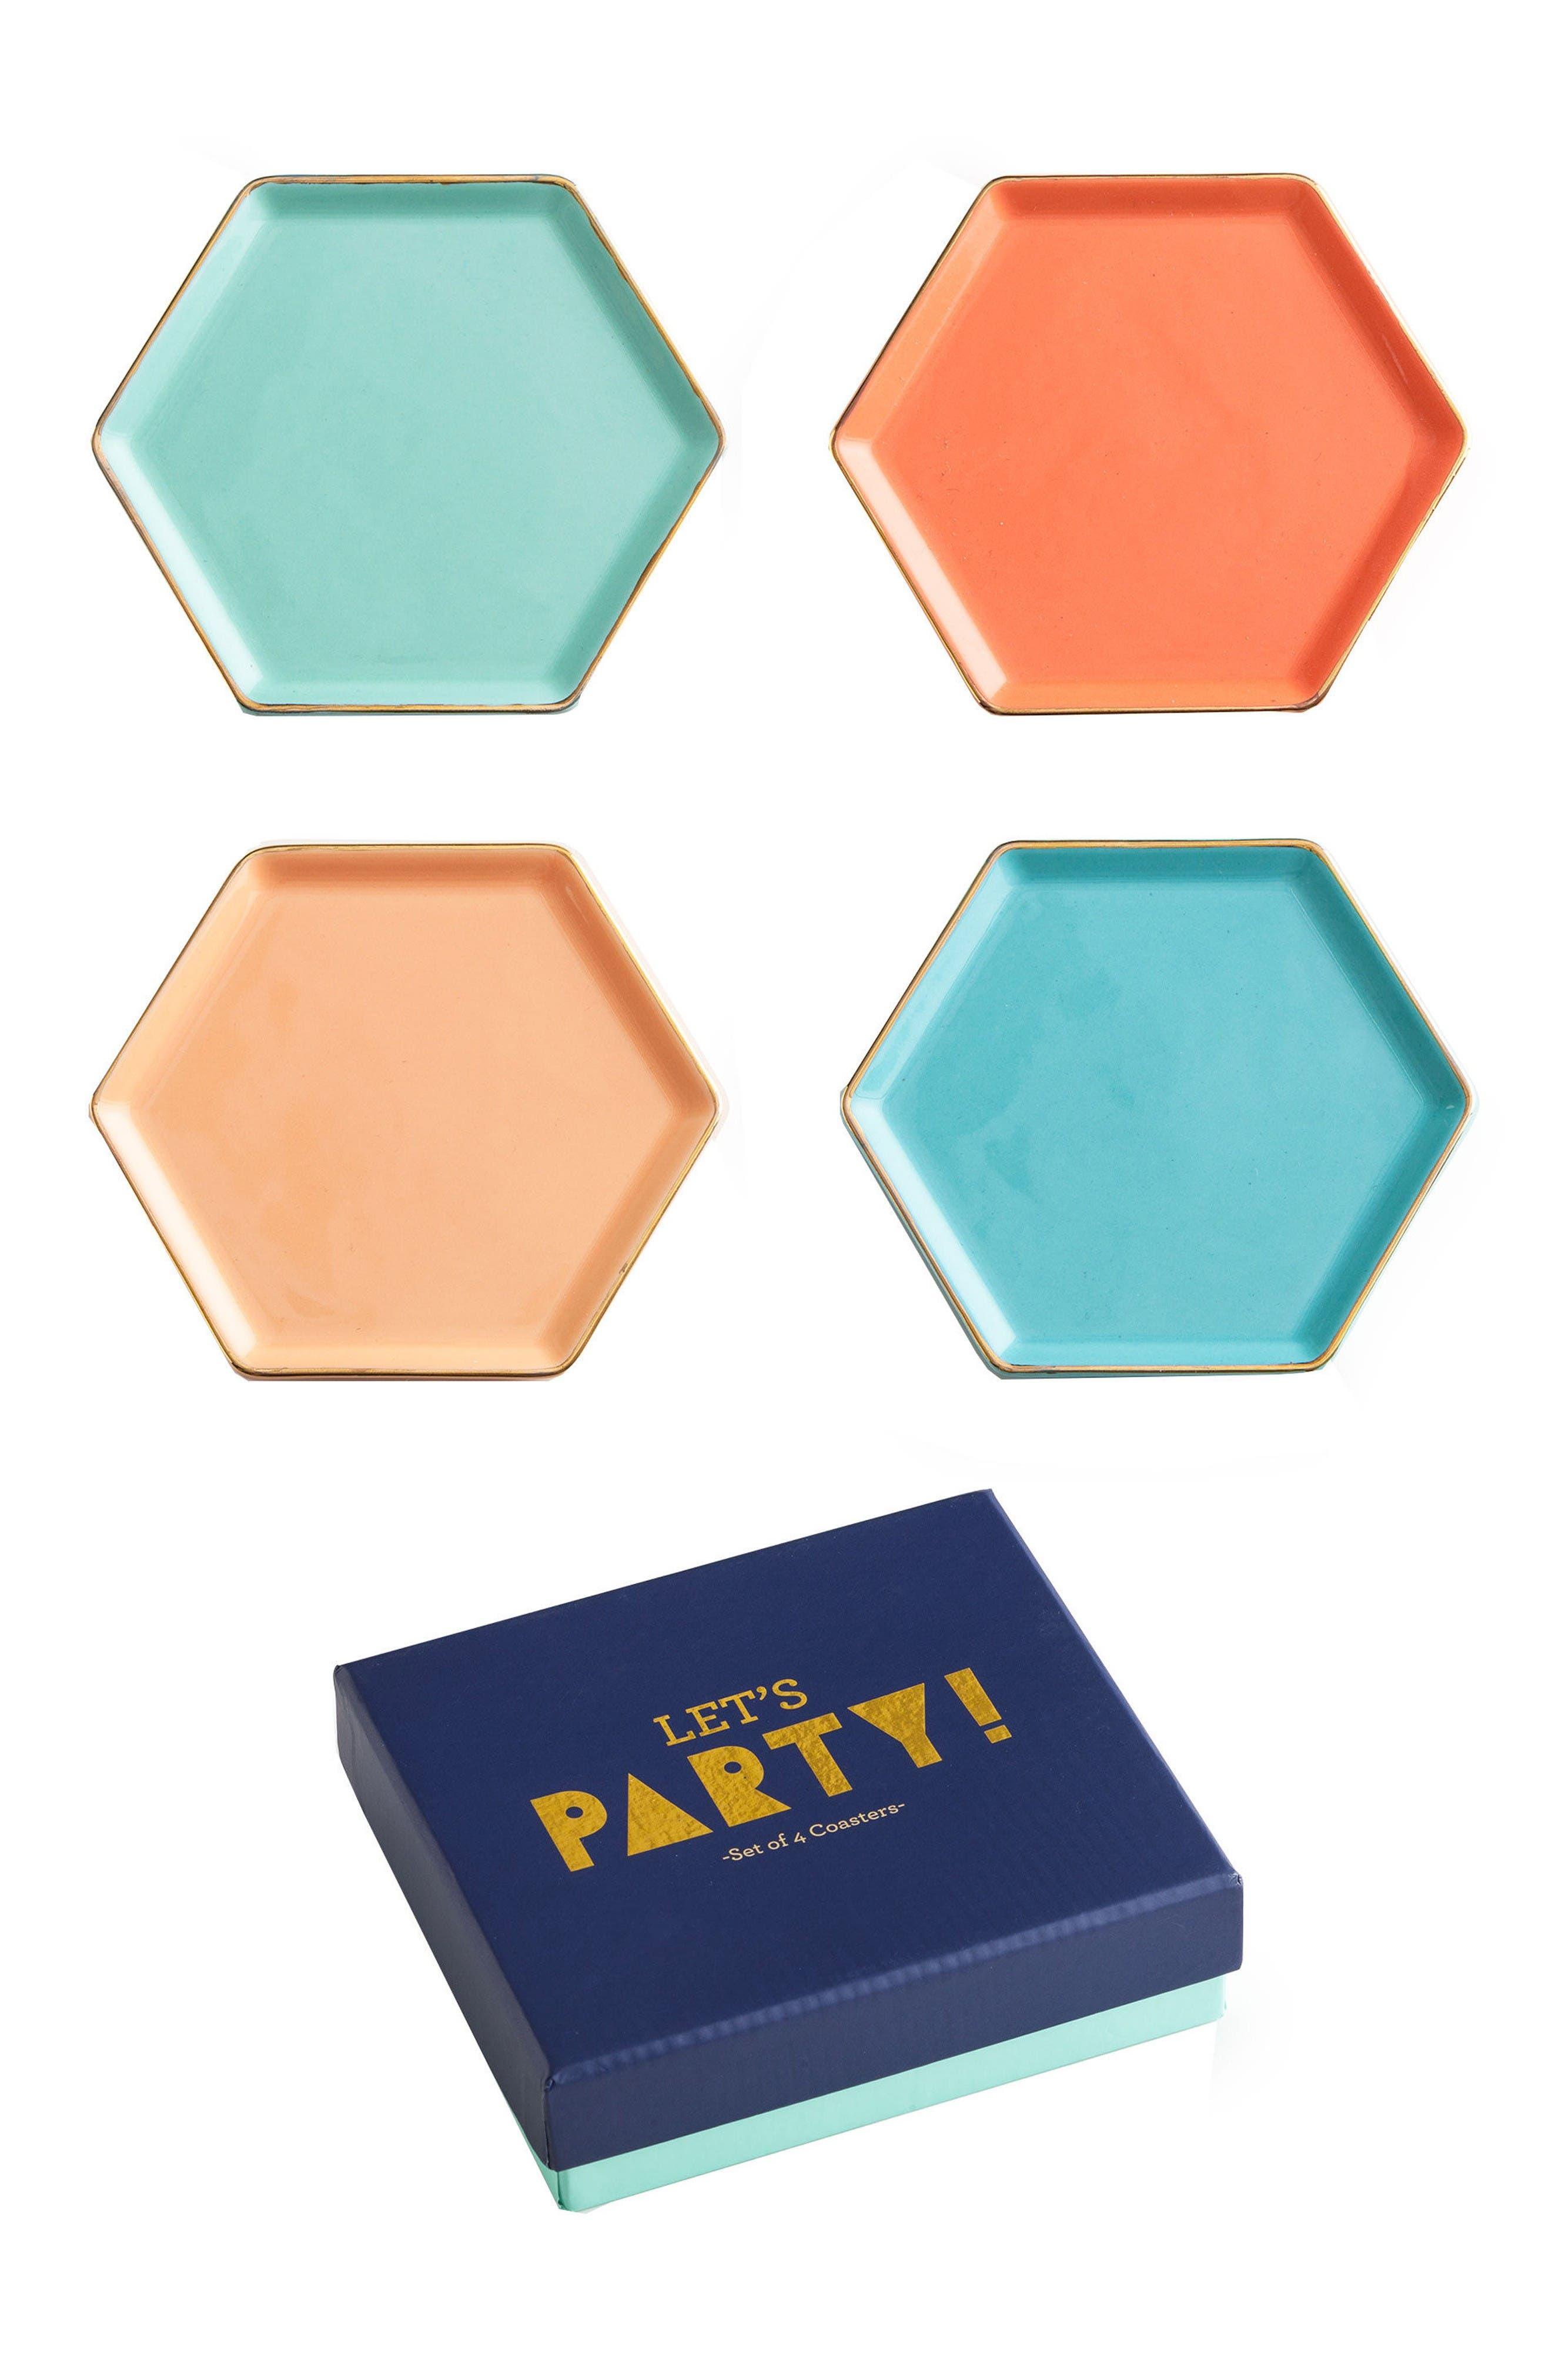 Rosanna Let's Party Set of 4 Hexagonal Coasters